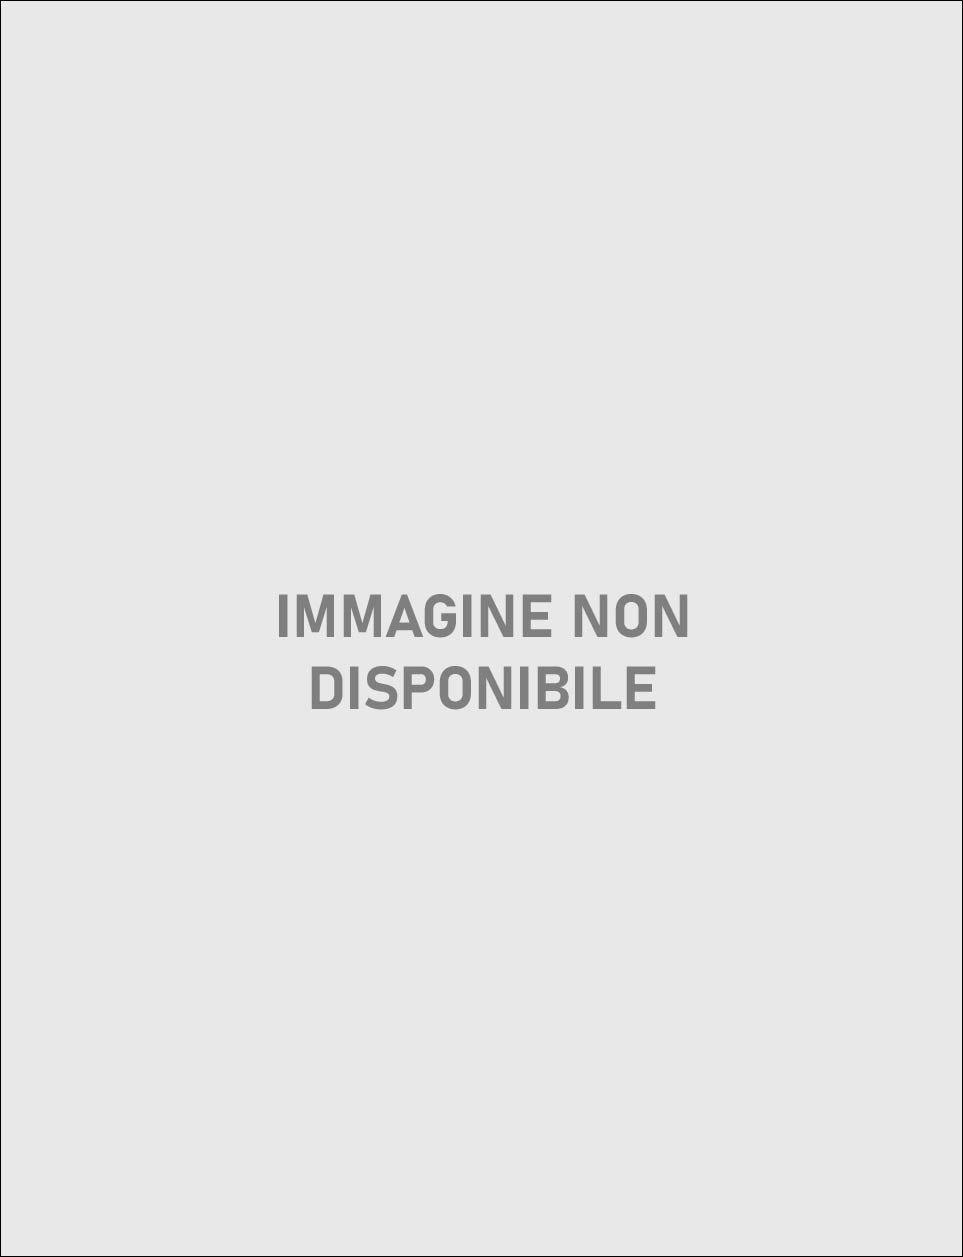 Fila Felpa Uomo color grigio | Pablimaca | Shopping online